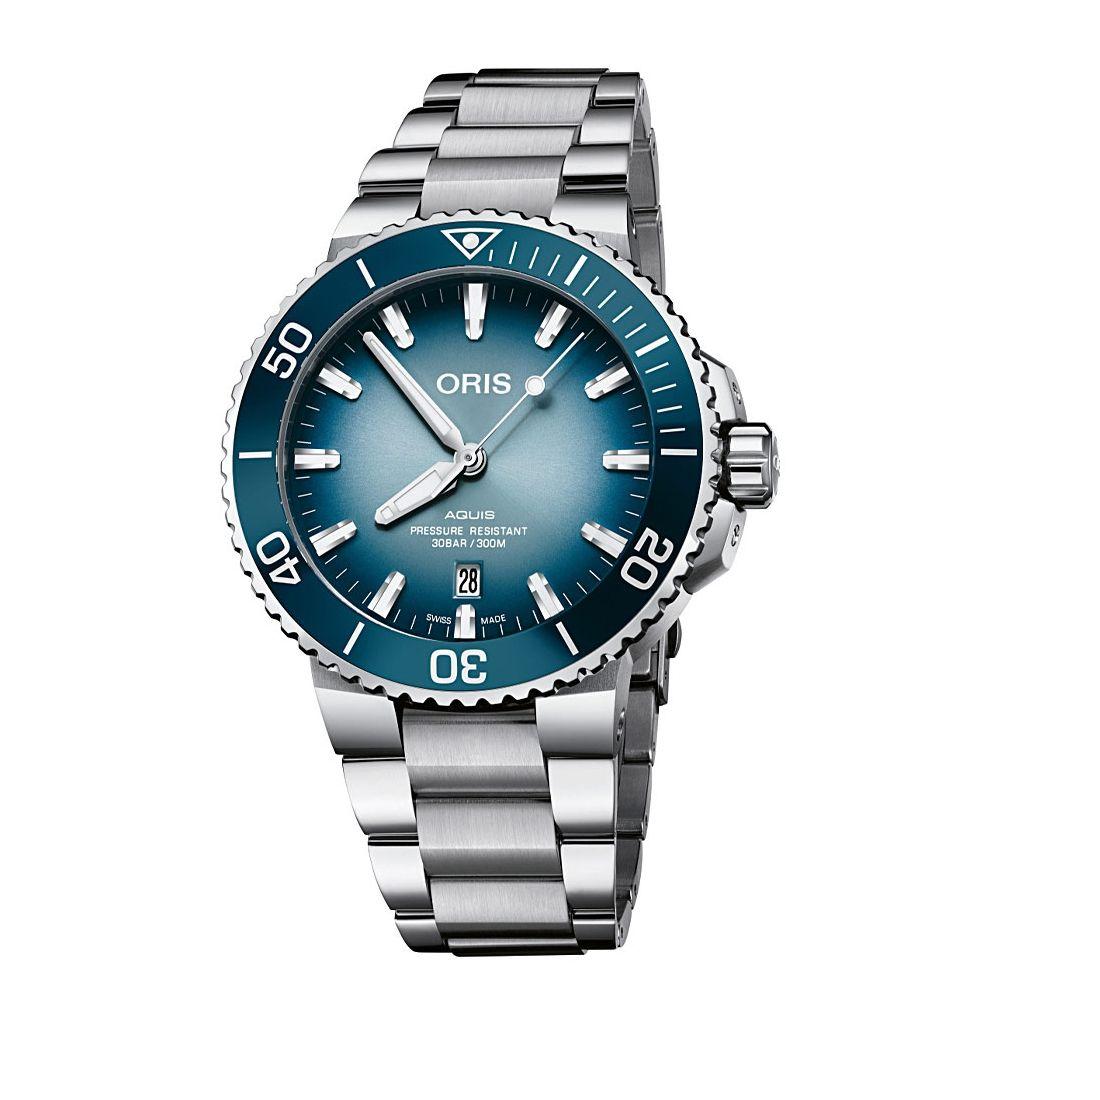 Reloj Oris Lake Baikal Limited Edition -  01 733 7730 4175-SET  - 1